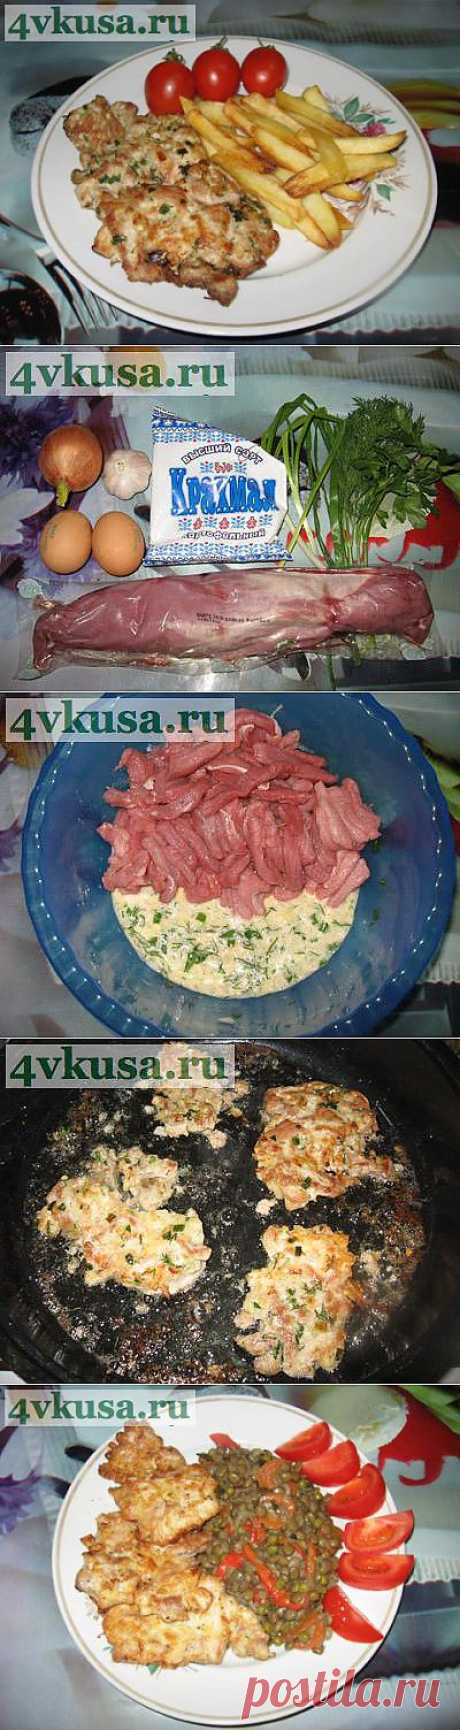 Мясо фри за 5 минут. Фоторецепт. | 4vkusa.ru